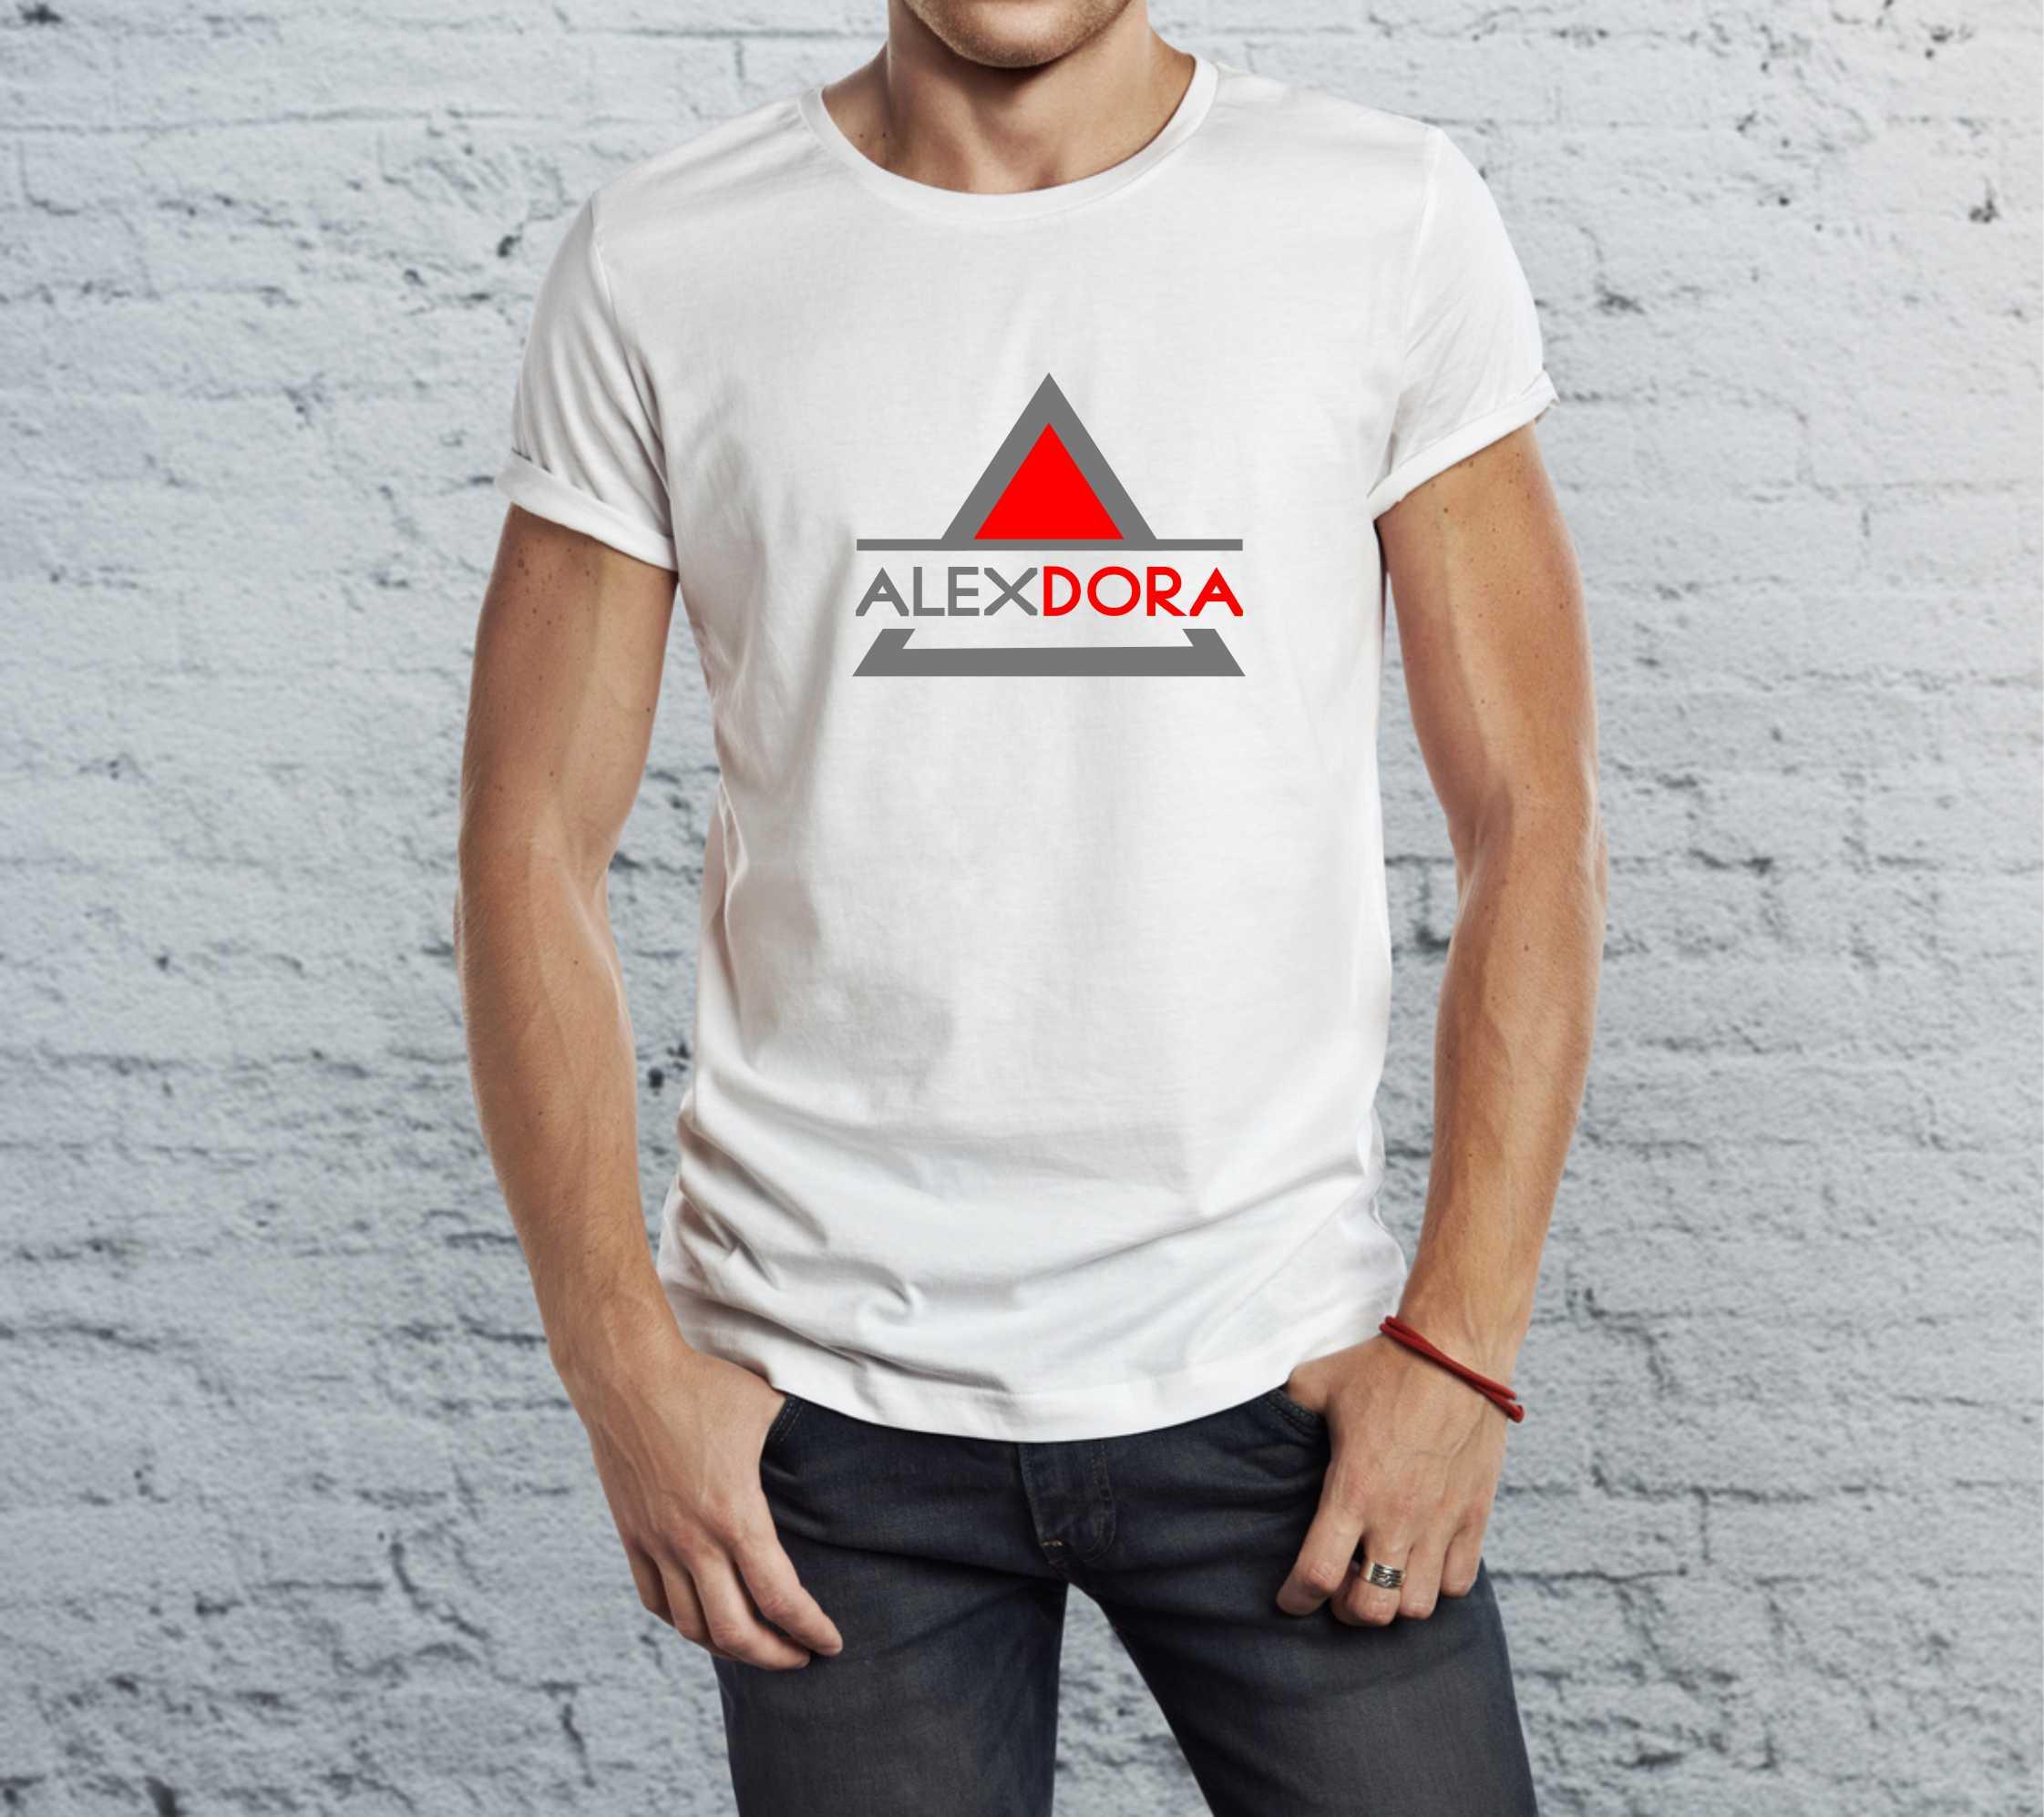 Необходим дизайнер для доработки логотипа бренда одежды фото f_0915b39378866136.jpg